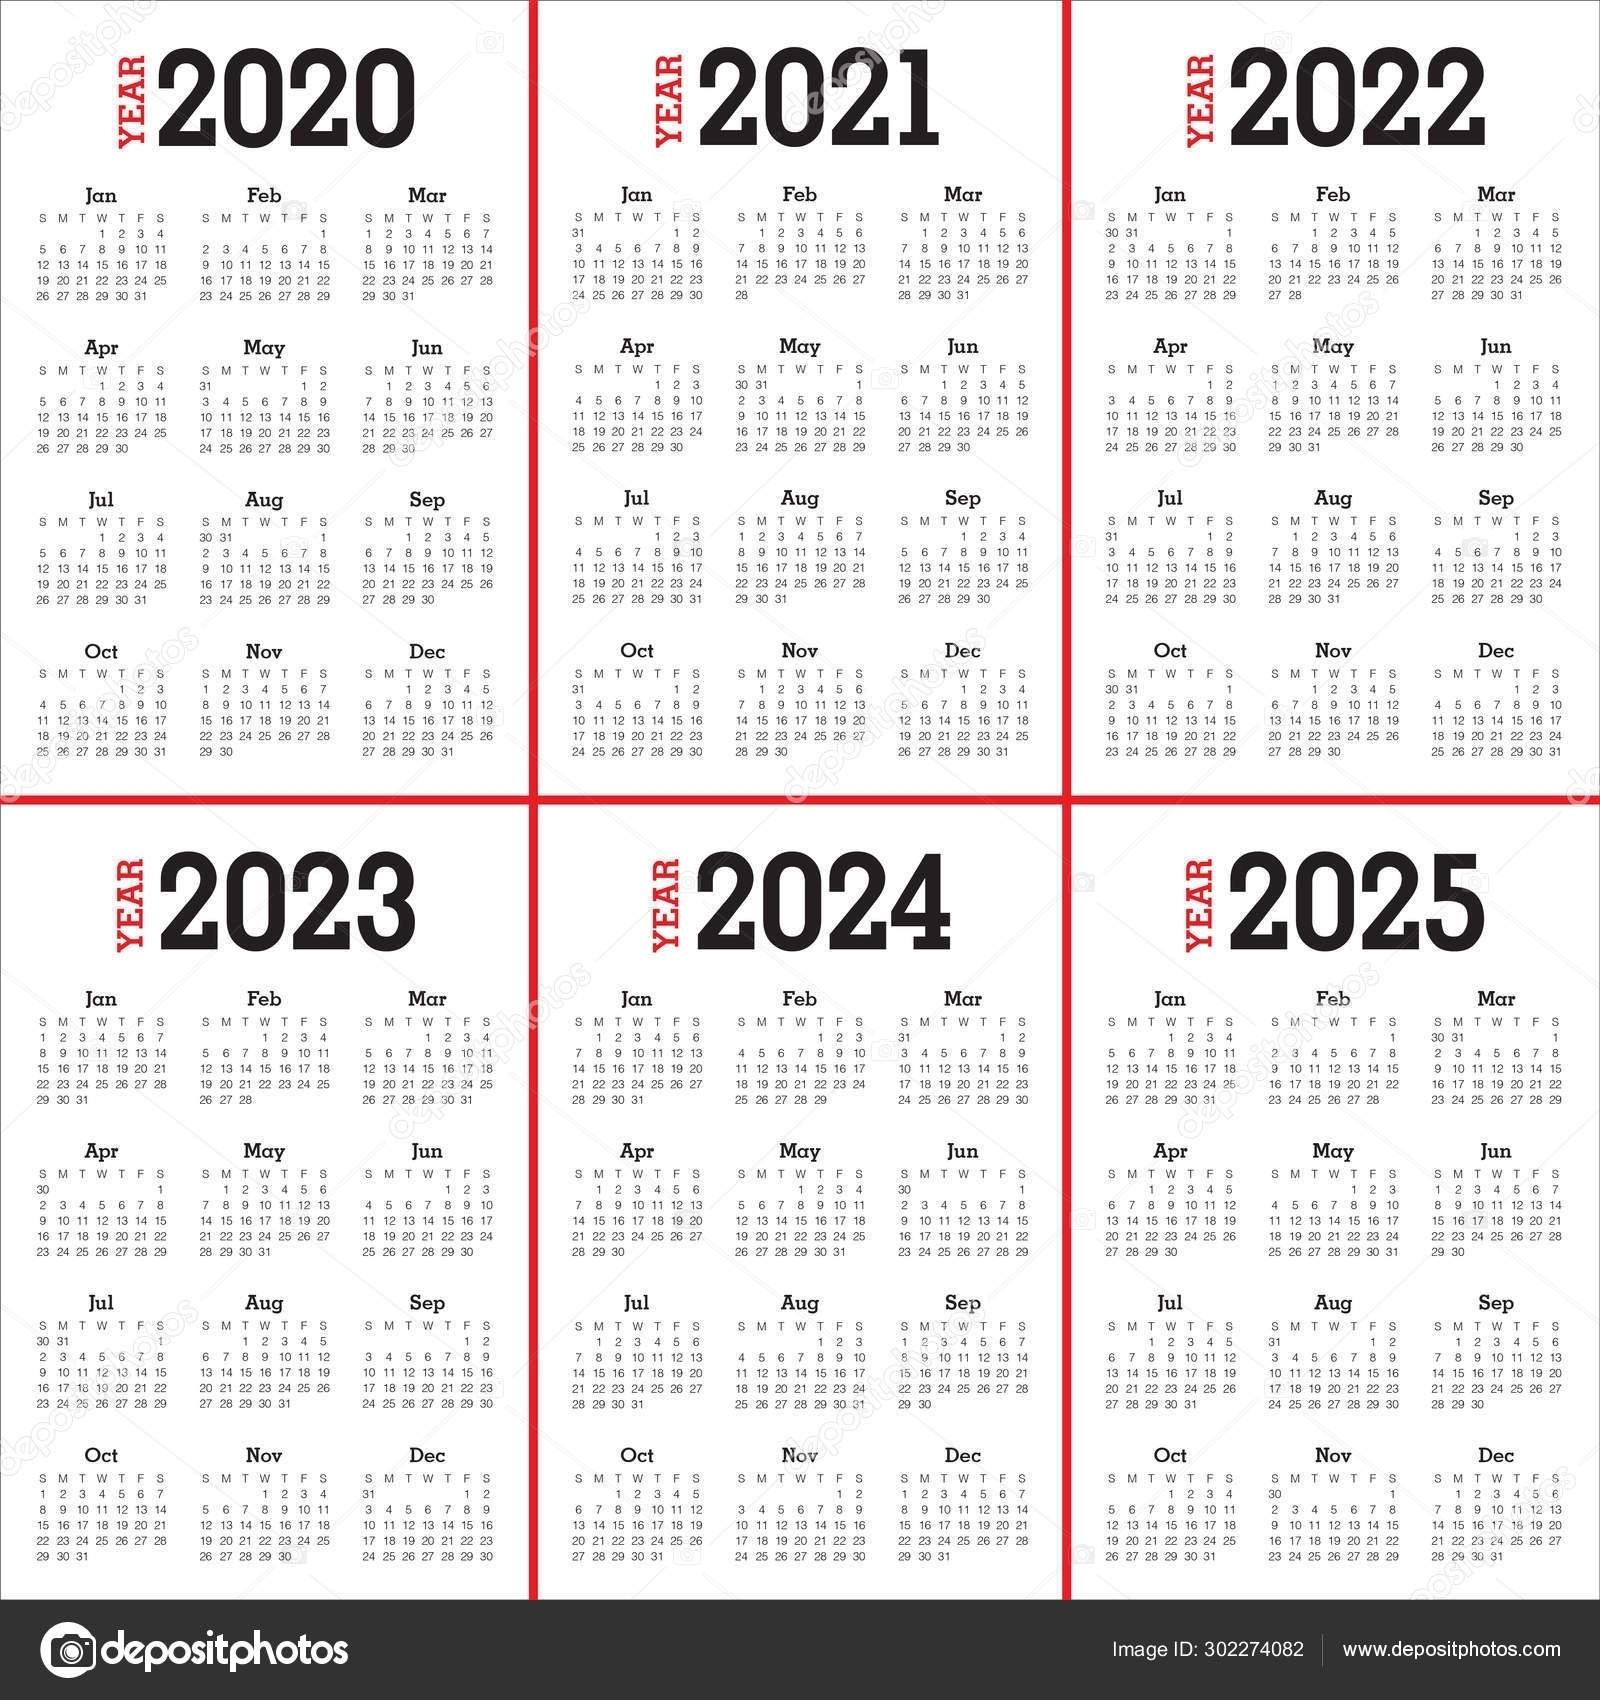 3 Year Calendar 2021 To 2023 | Month Calendar Printable